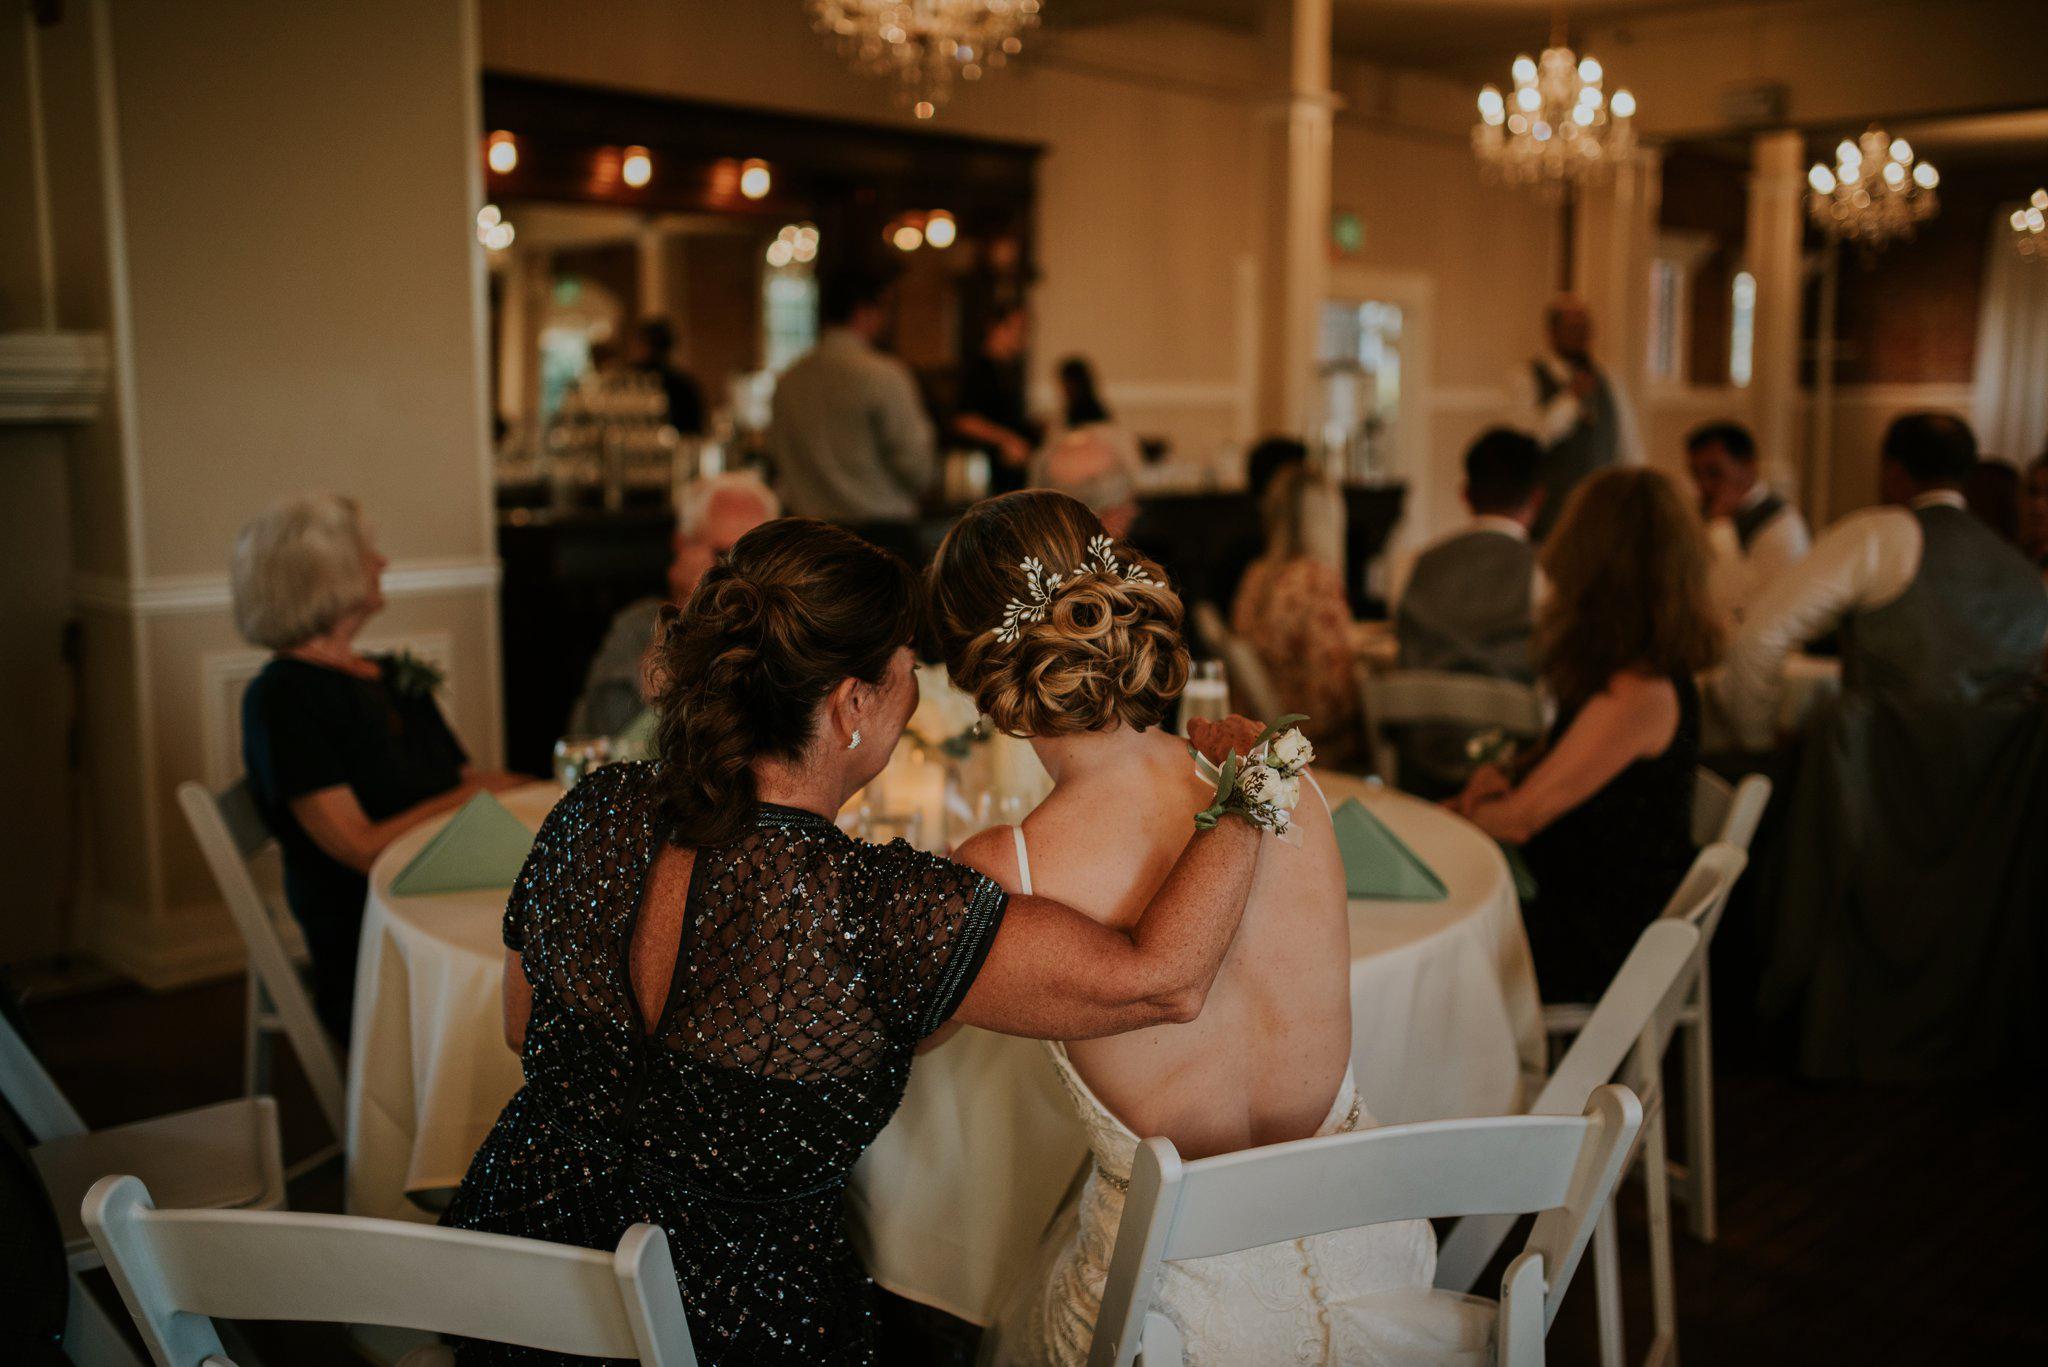 hollywood-school-house-wedding-seattle-photographer-caitlyn-nikula-98.jpg